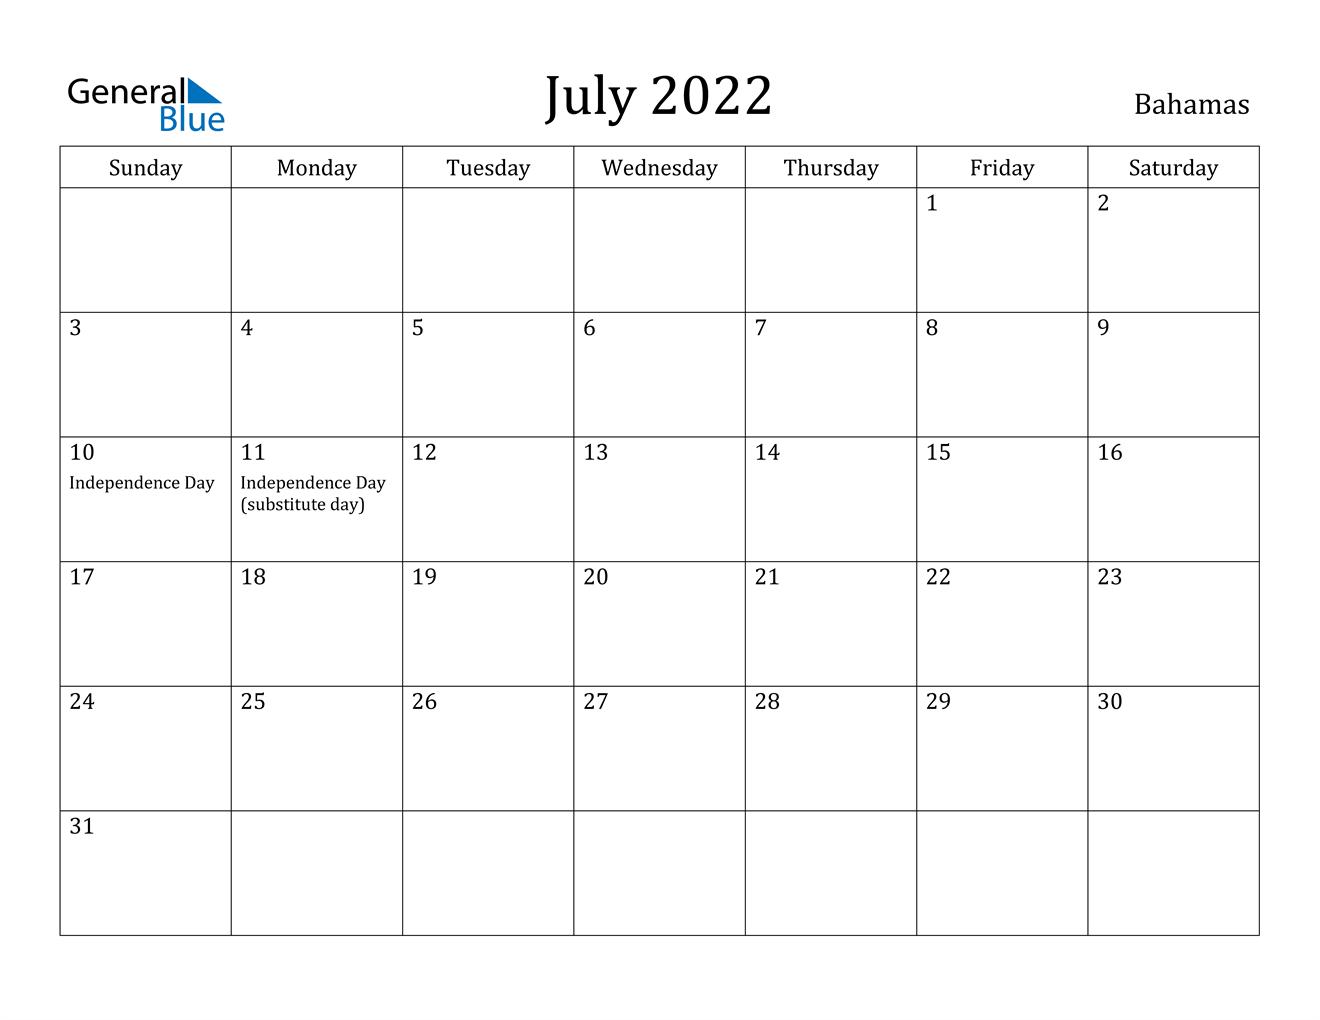 Calendar 2022 July.Bahamas July 2022 Calendar With Holidays